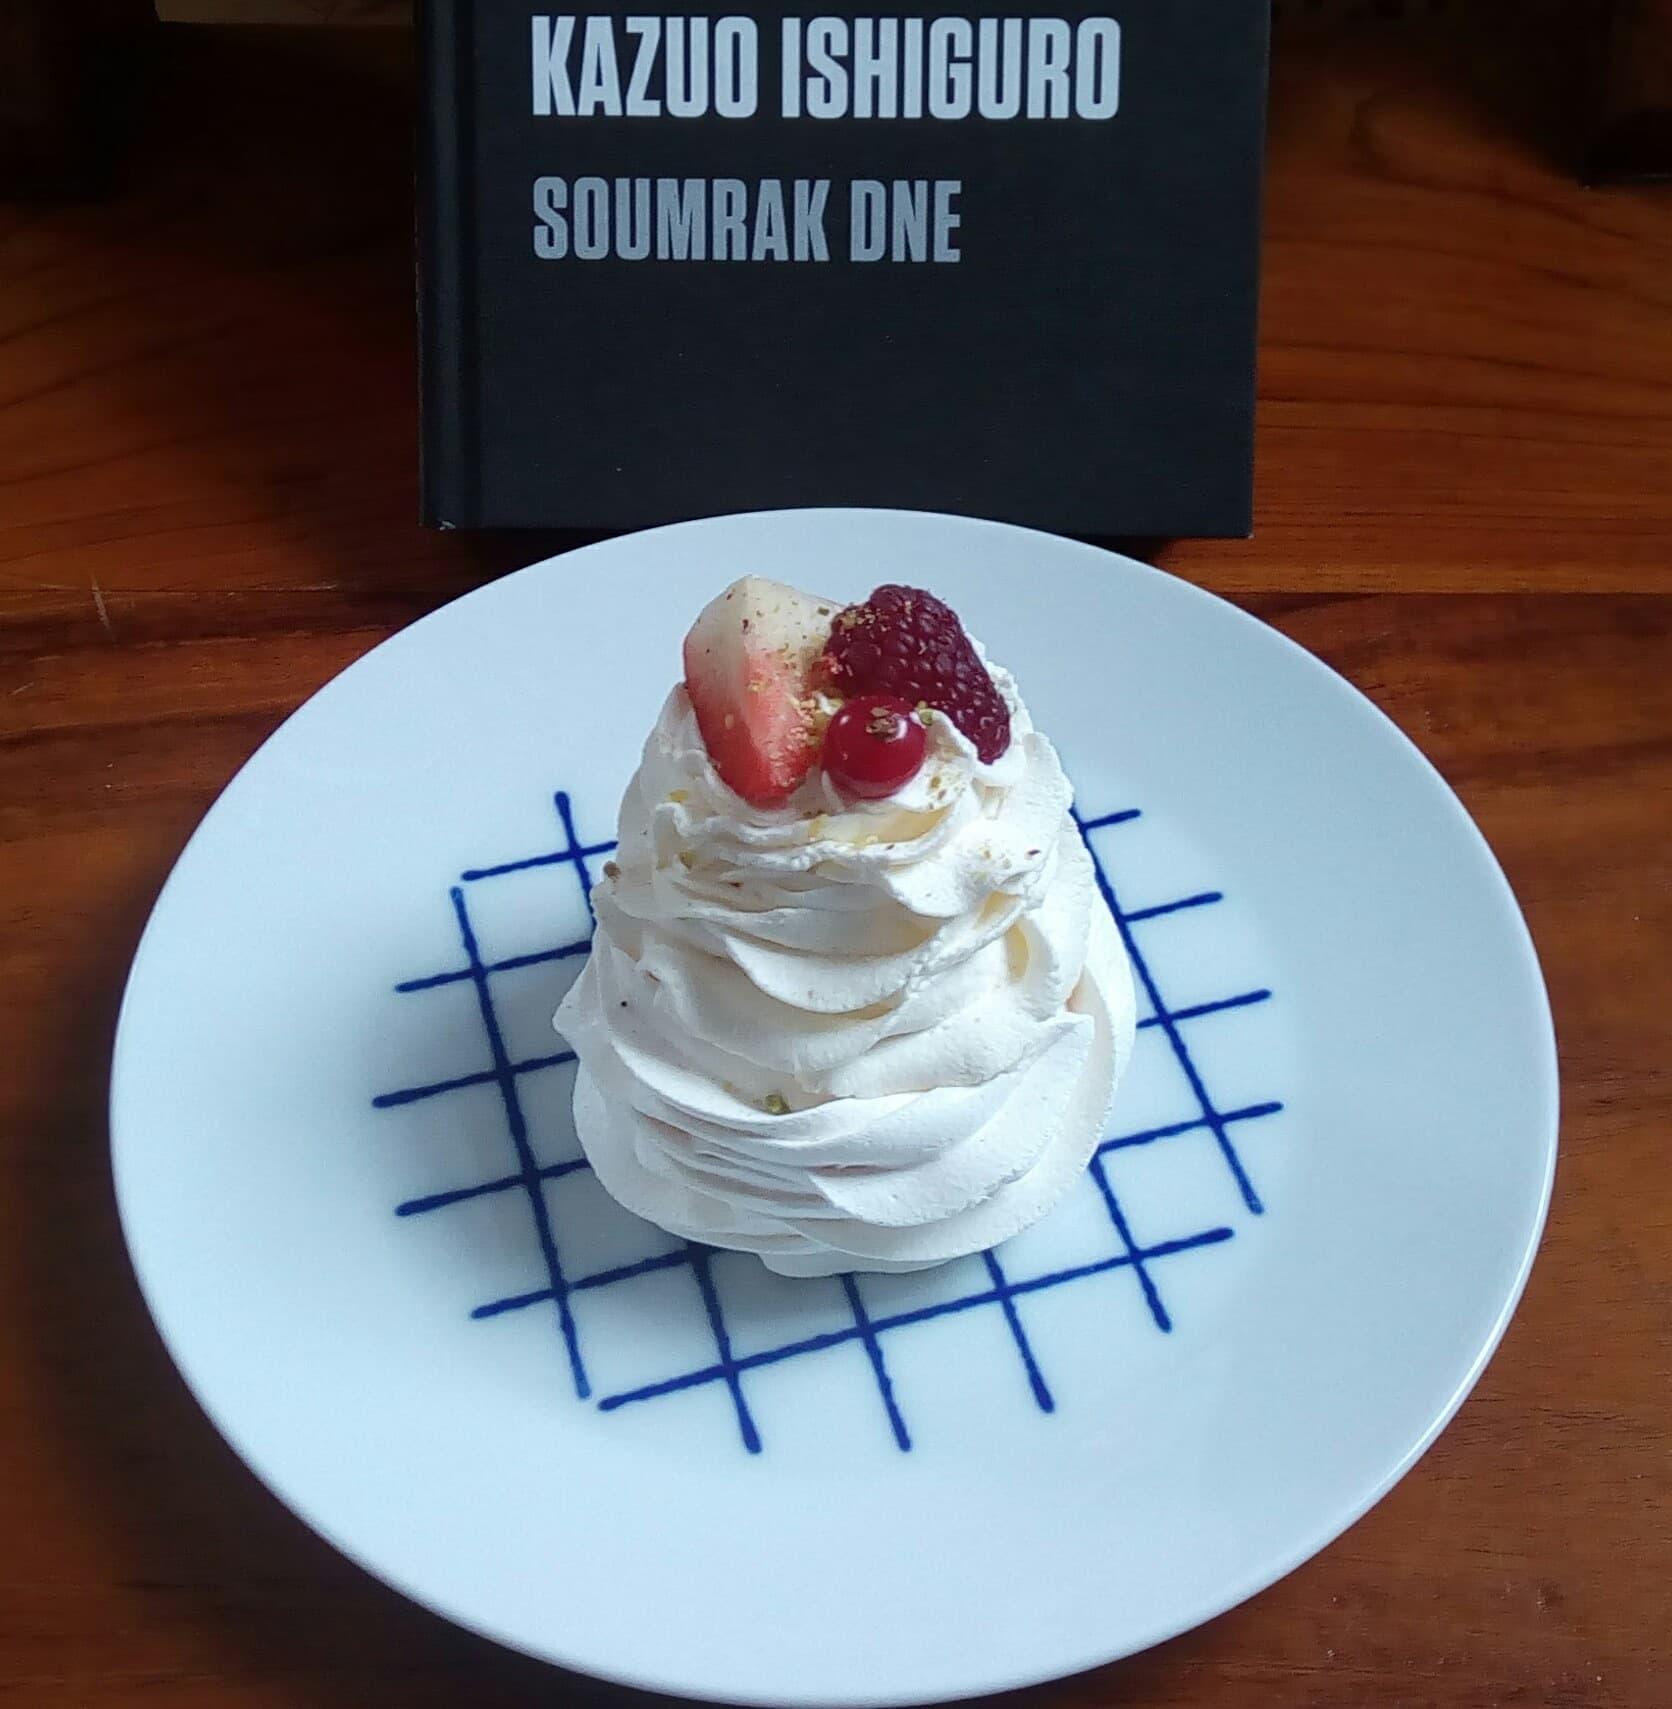 Kazuo Ishiguro: Soumrak dne